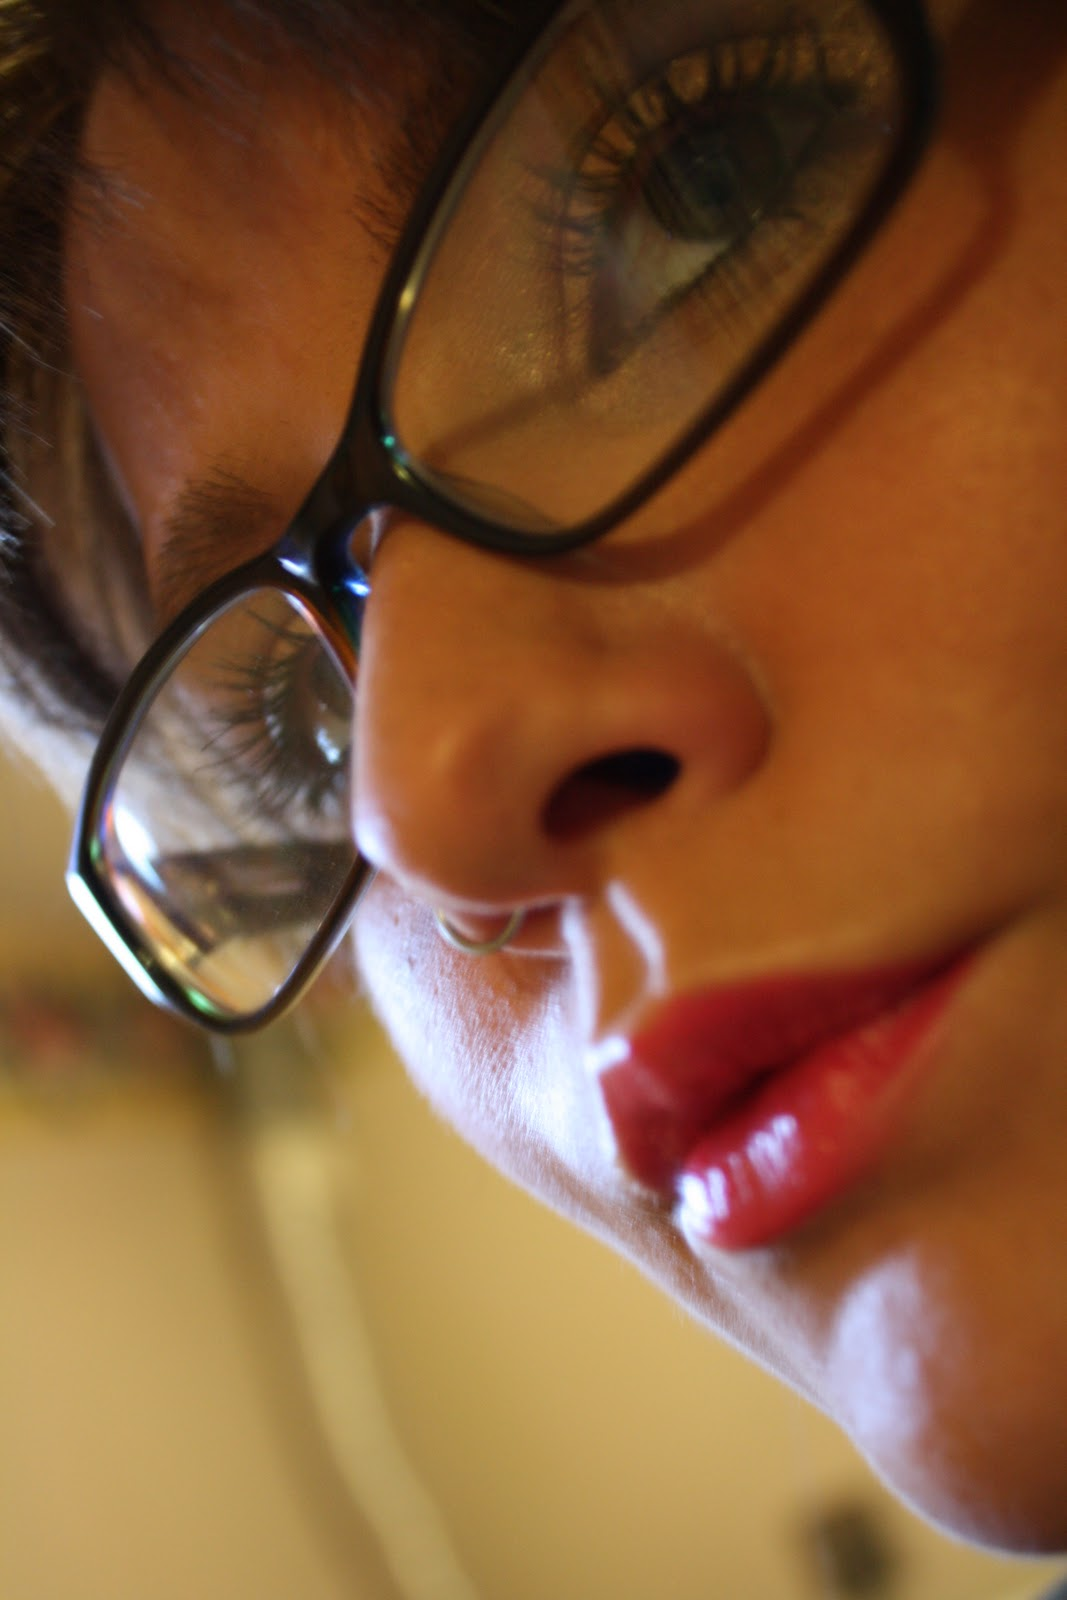 Swatch son Revlon Moon Drops Lipsticks 590 - Lilac Champagne